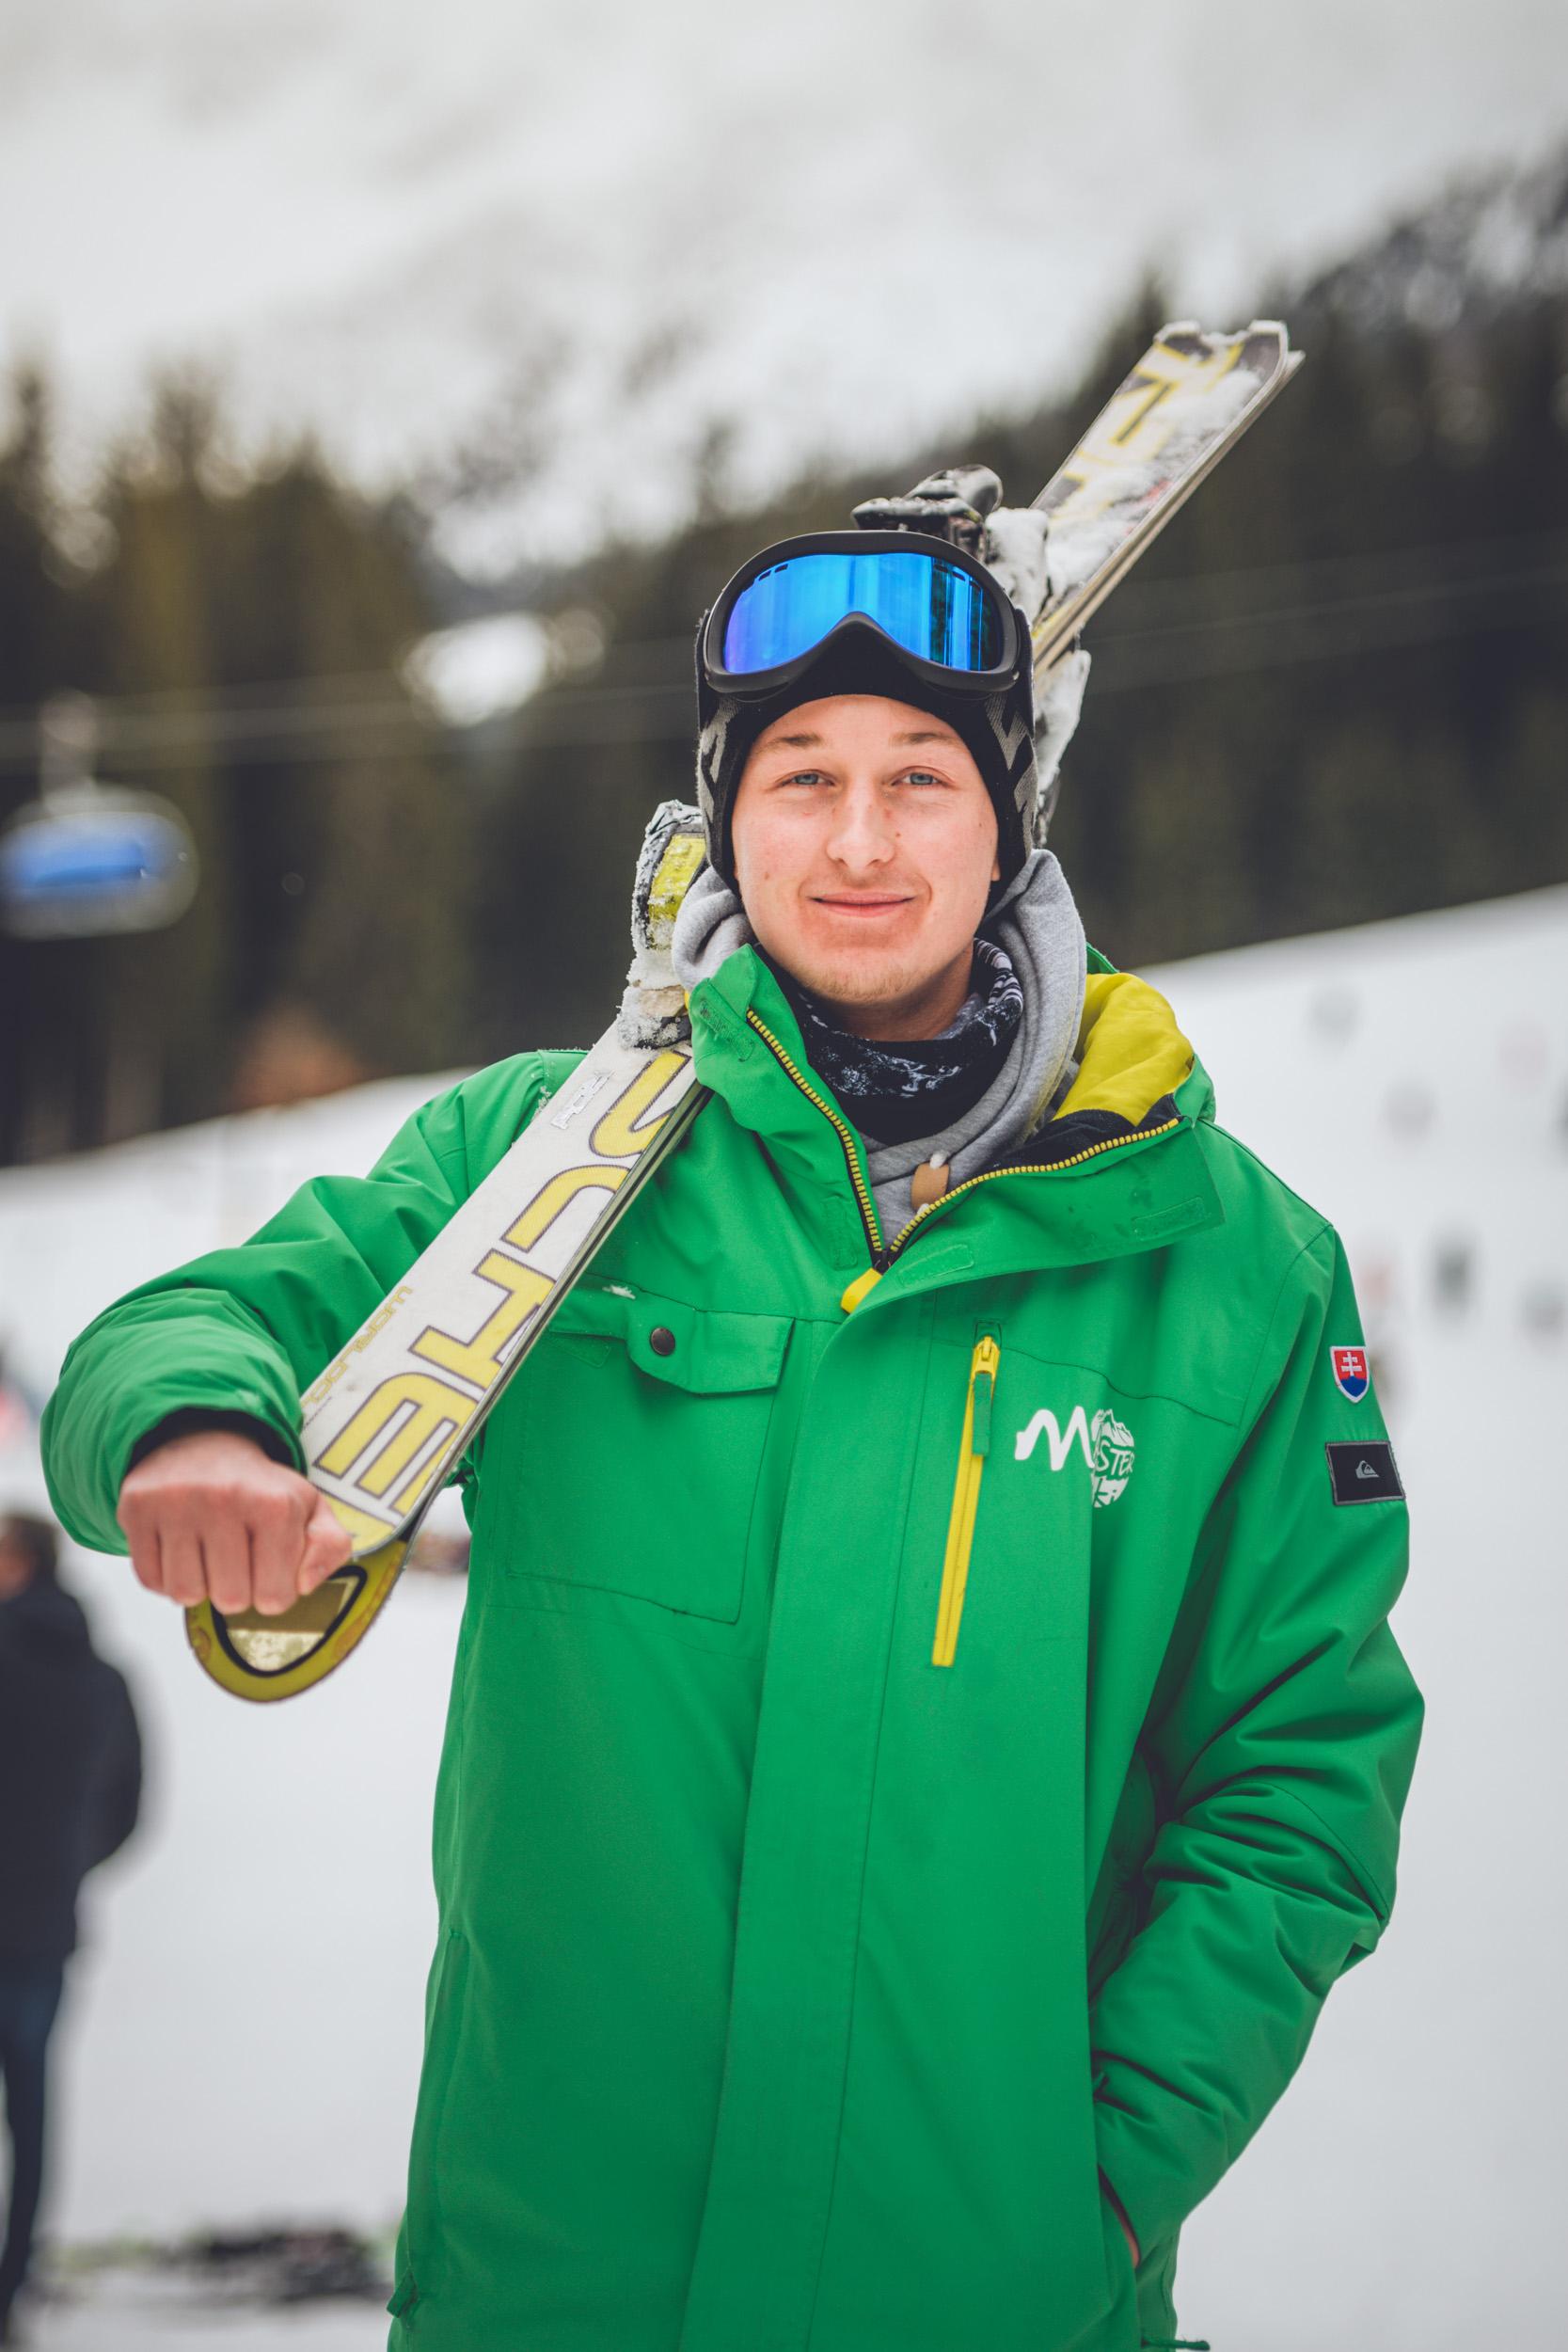 Martin Fillek